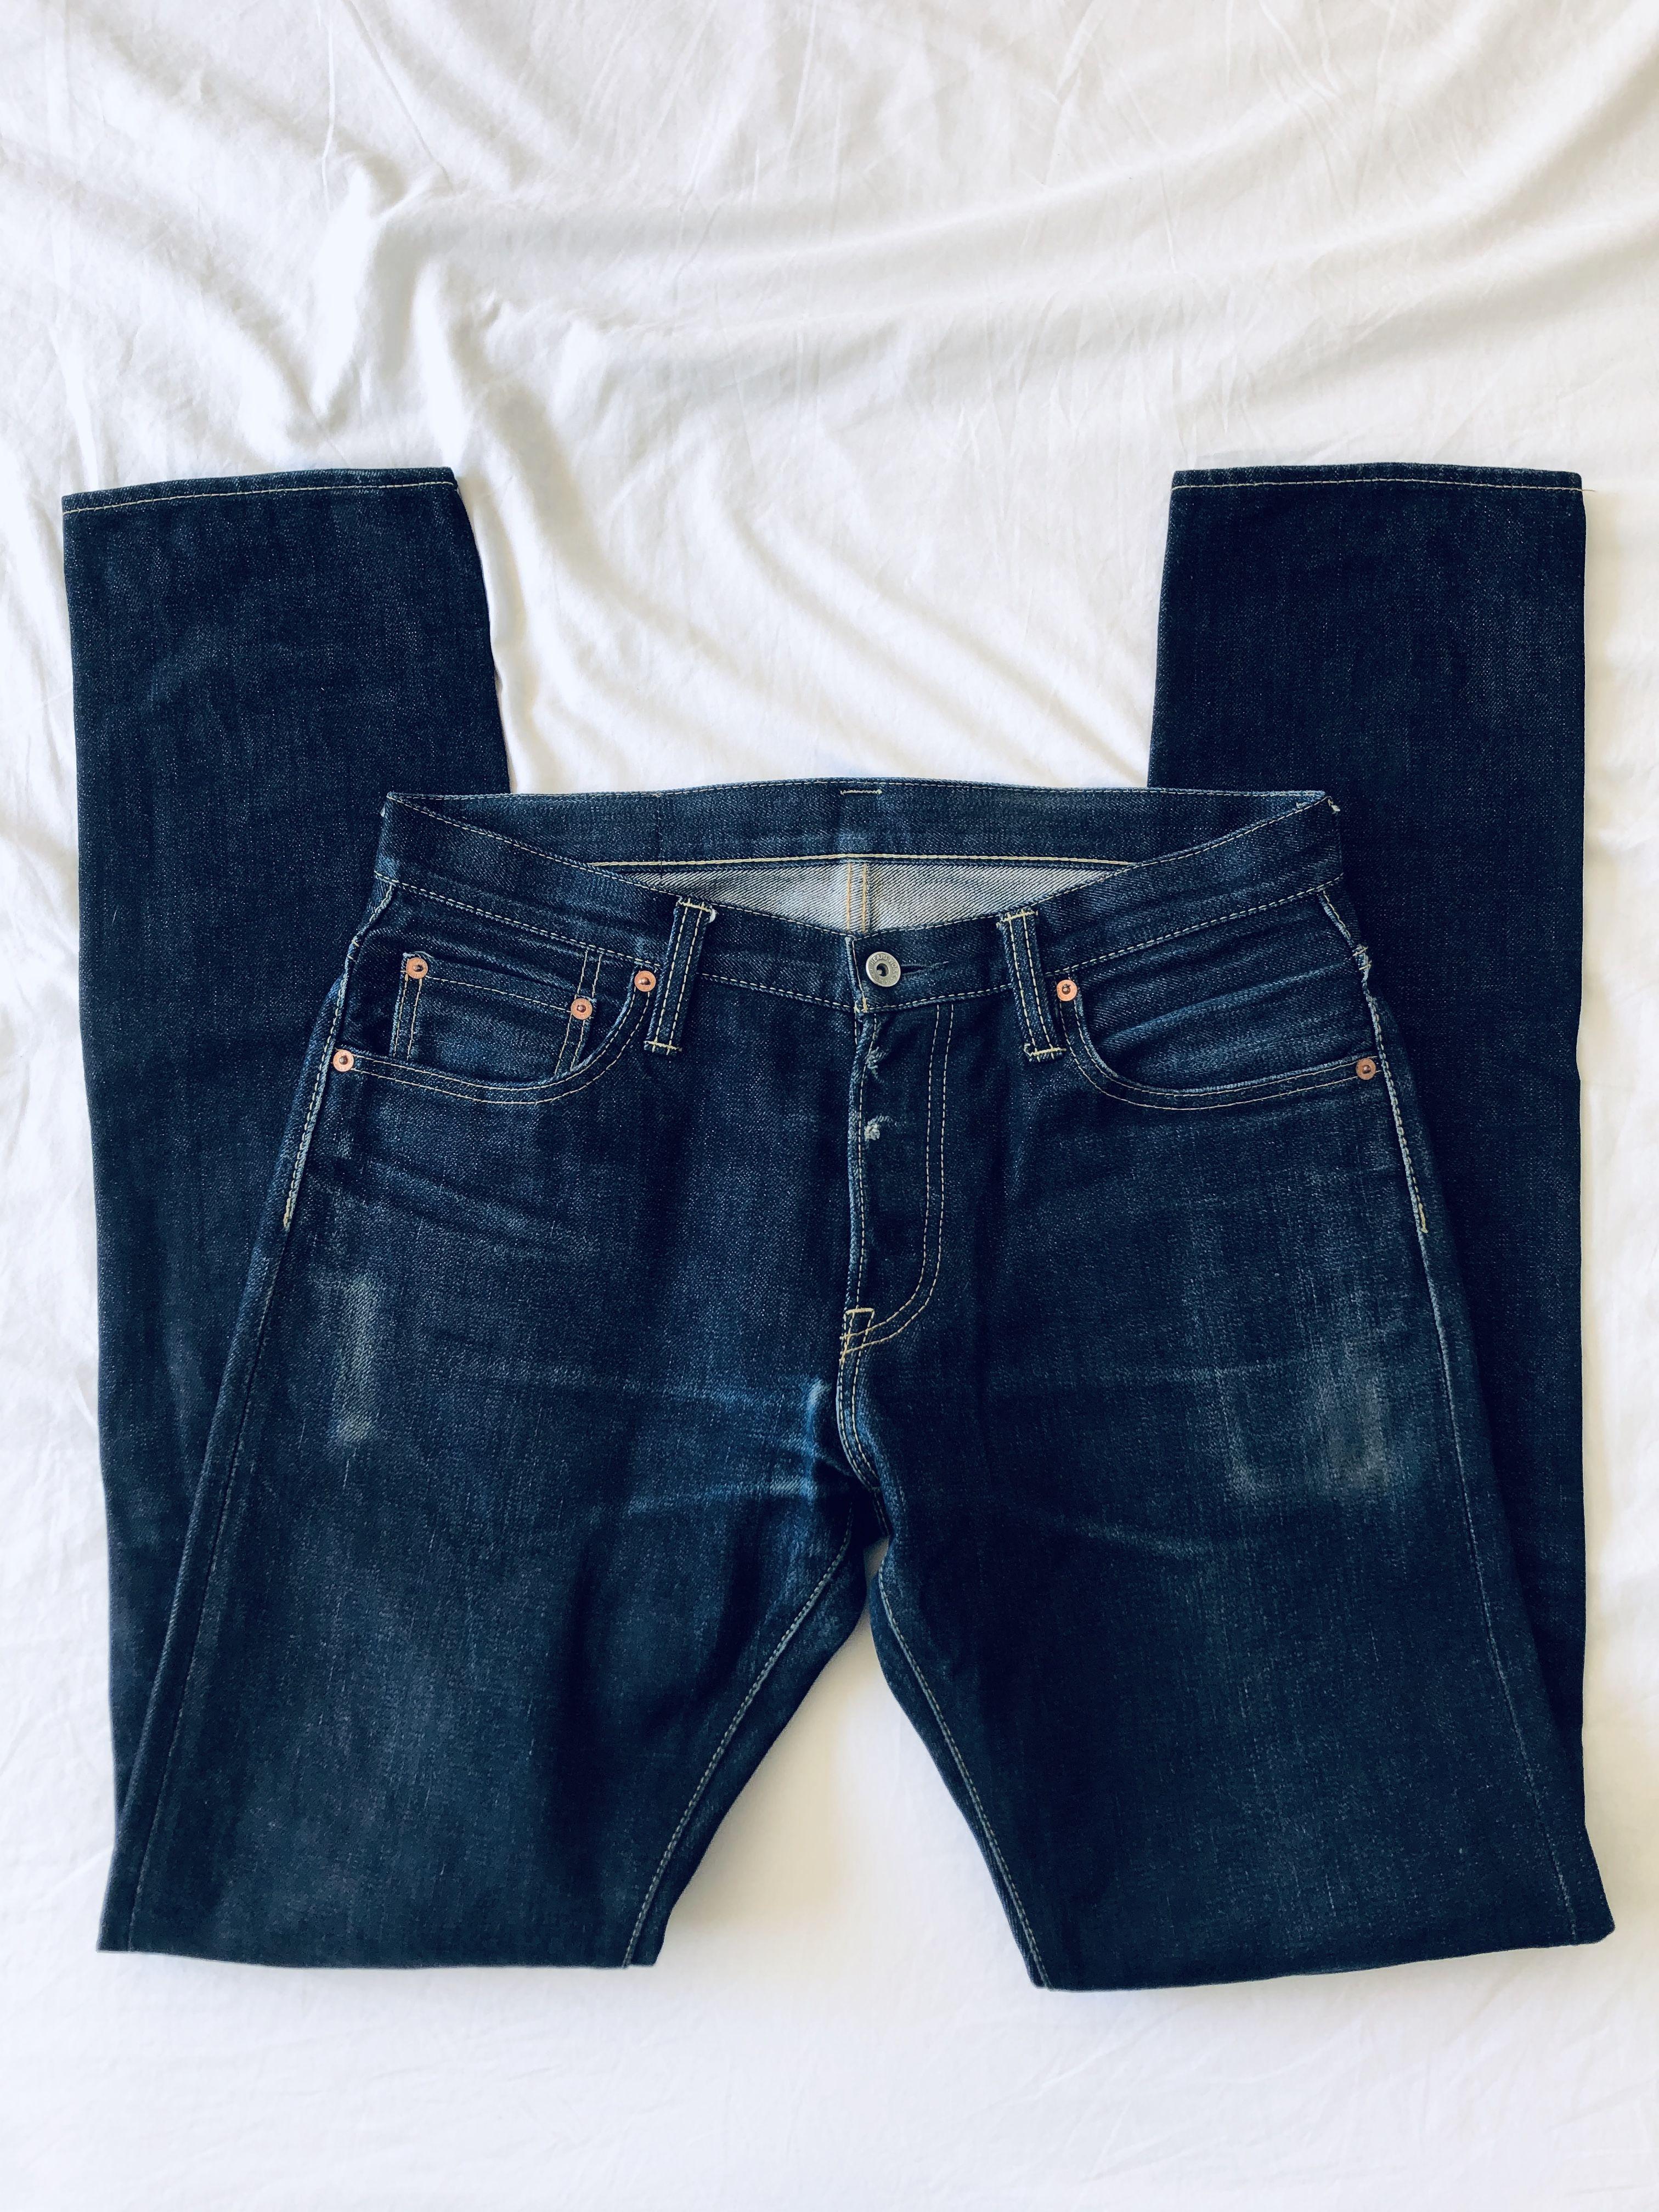 Iron Heart 301s-14 Raw Indigo Denim Jeans 32/36